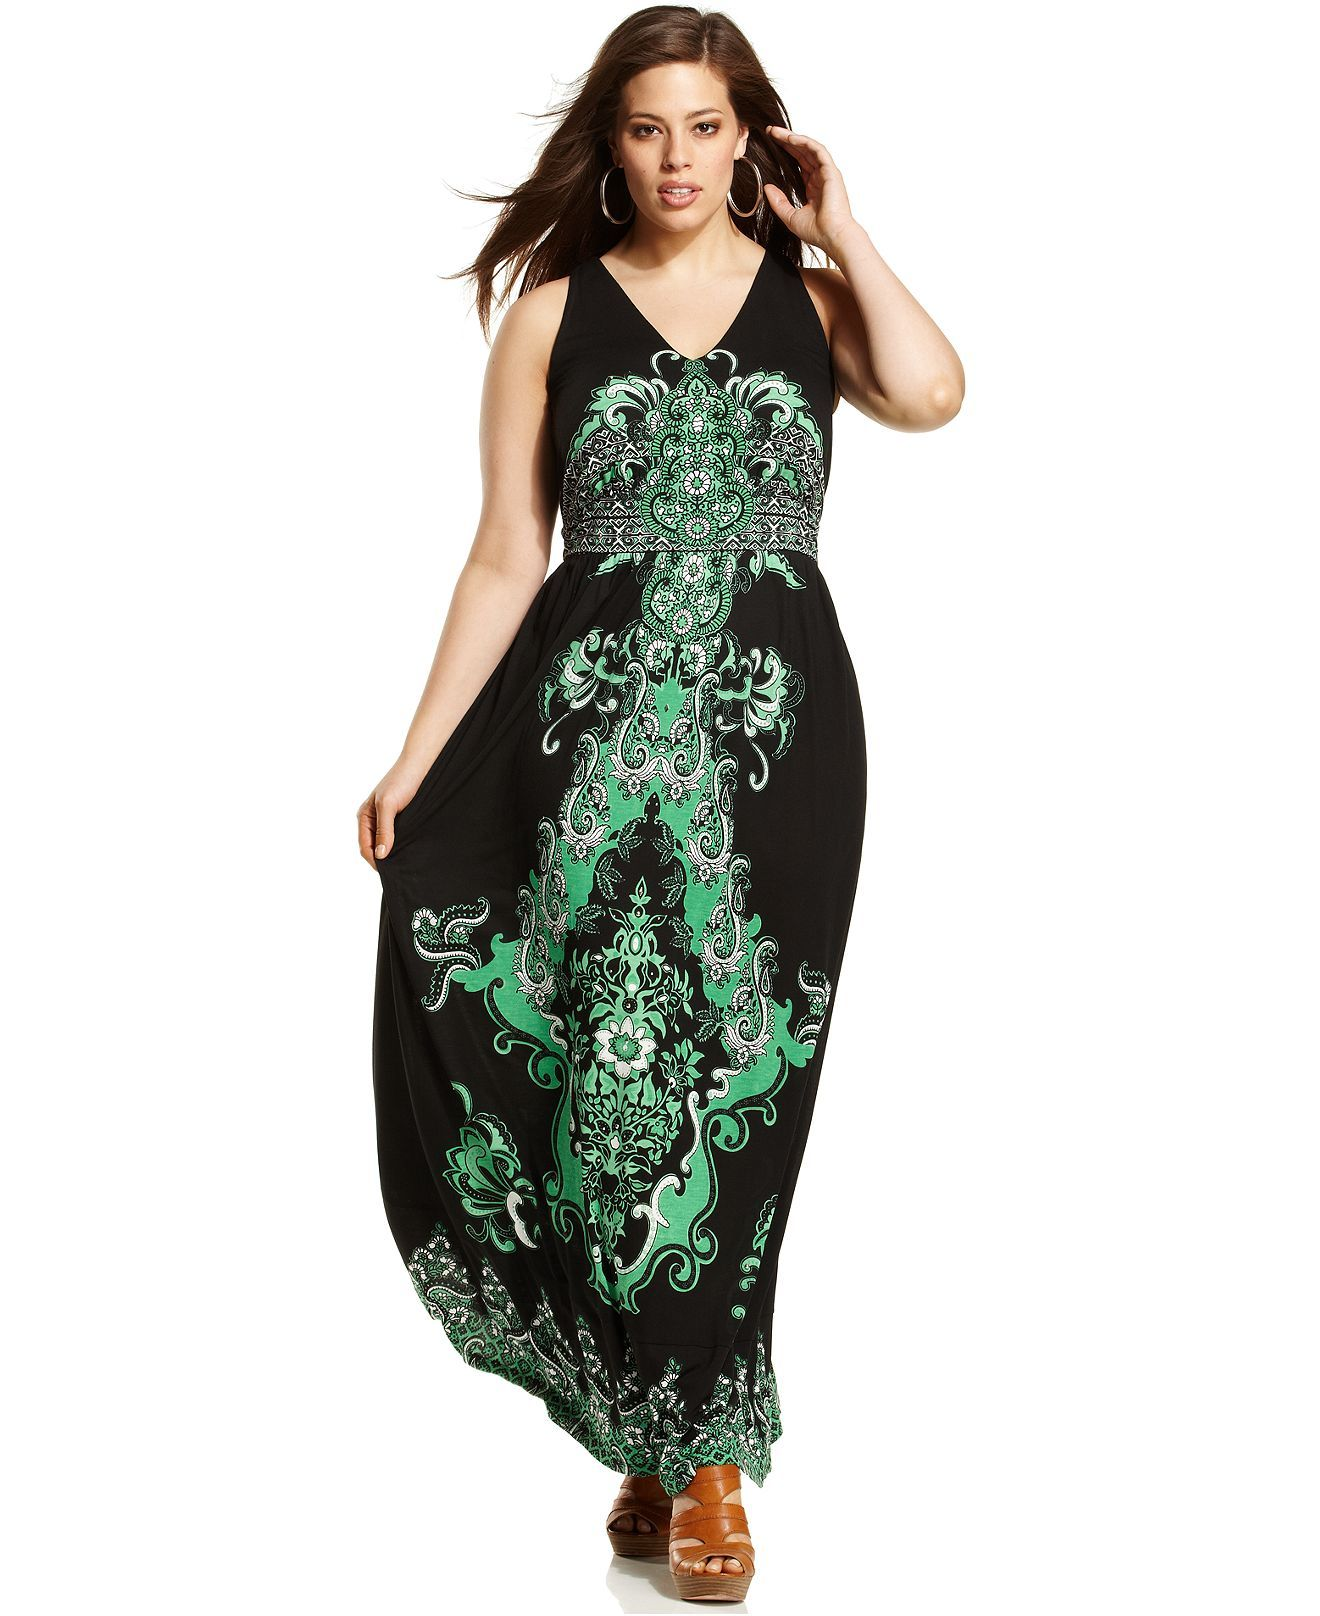 cc08edf356f13 Long Maxi Dresses Macy's – Fashion dresses